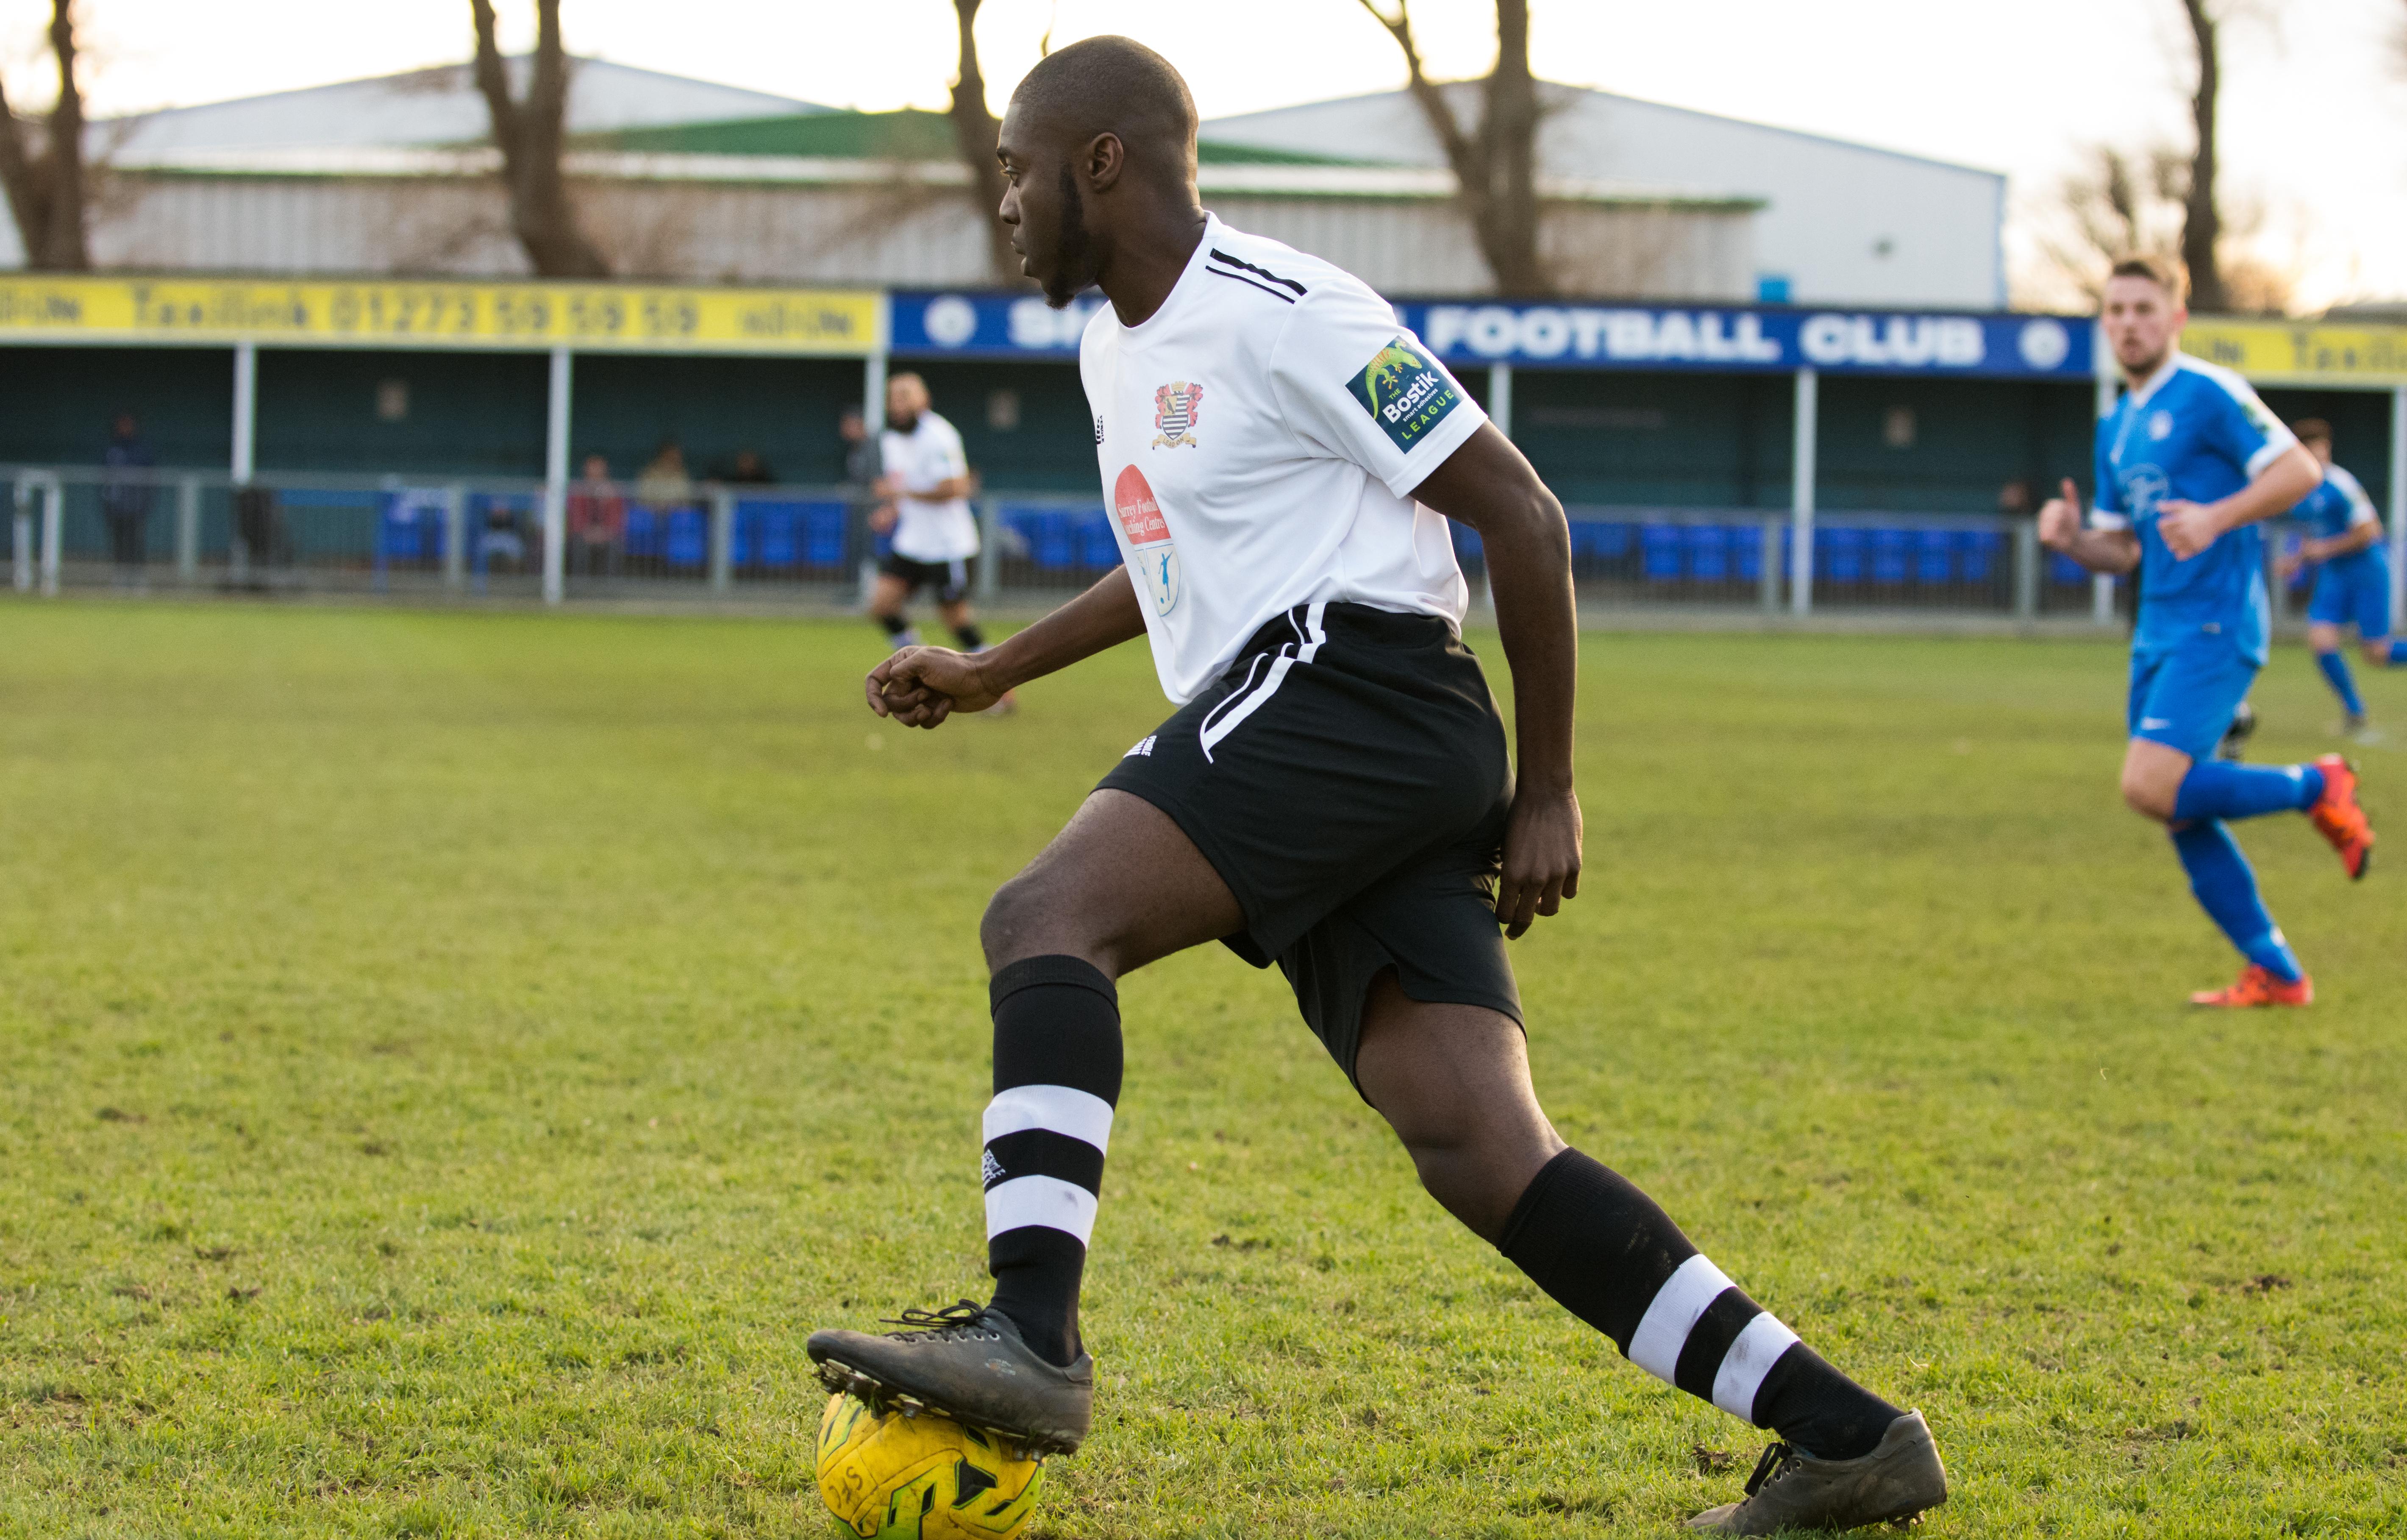 Shoreham FC vs Molesey FC 02.12.17 50